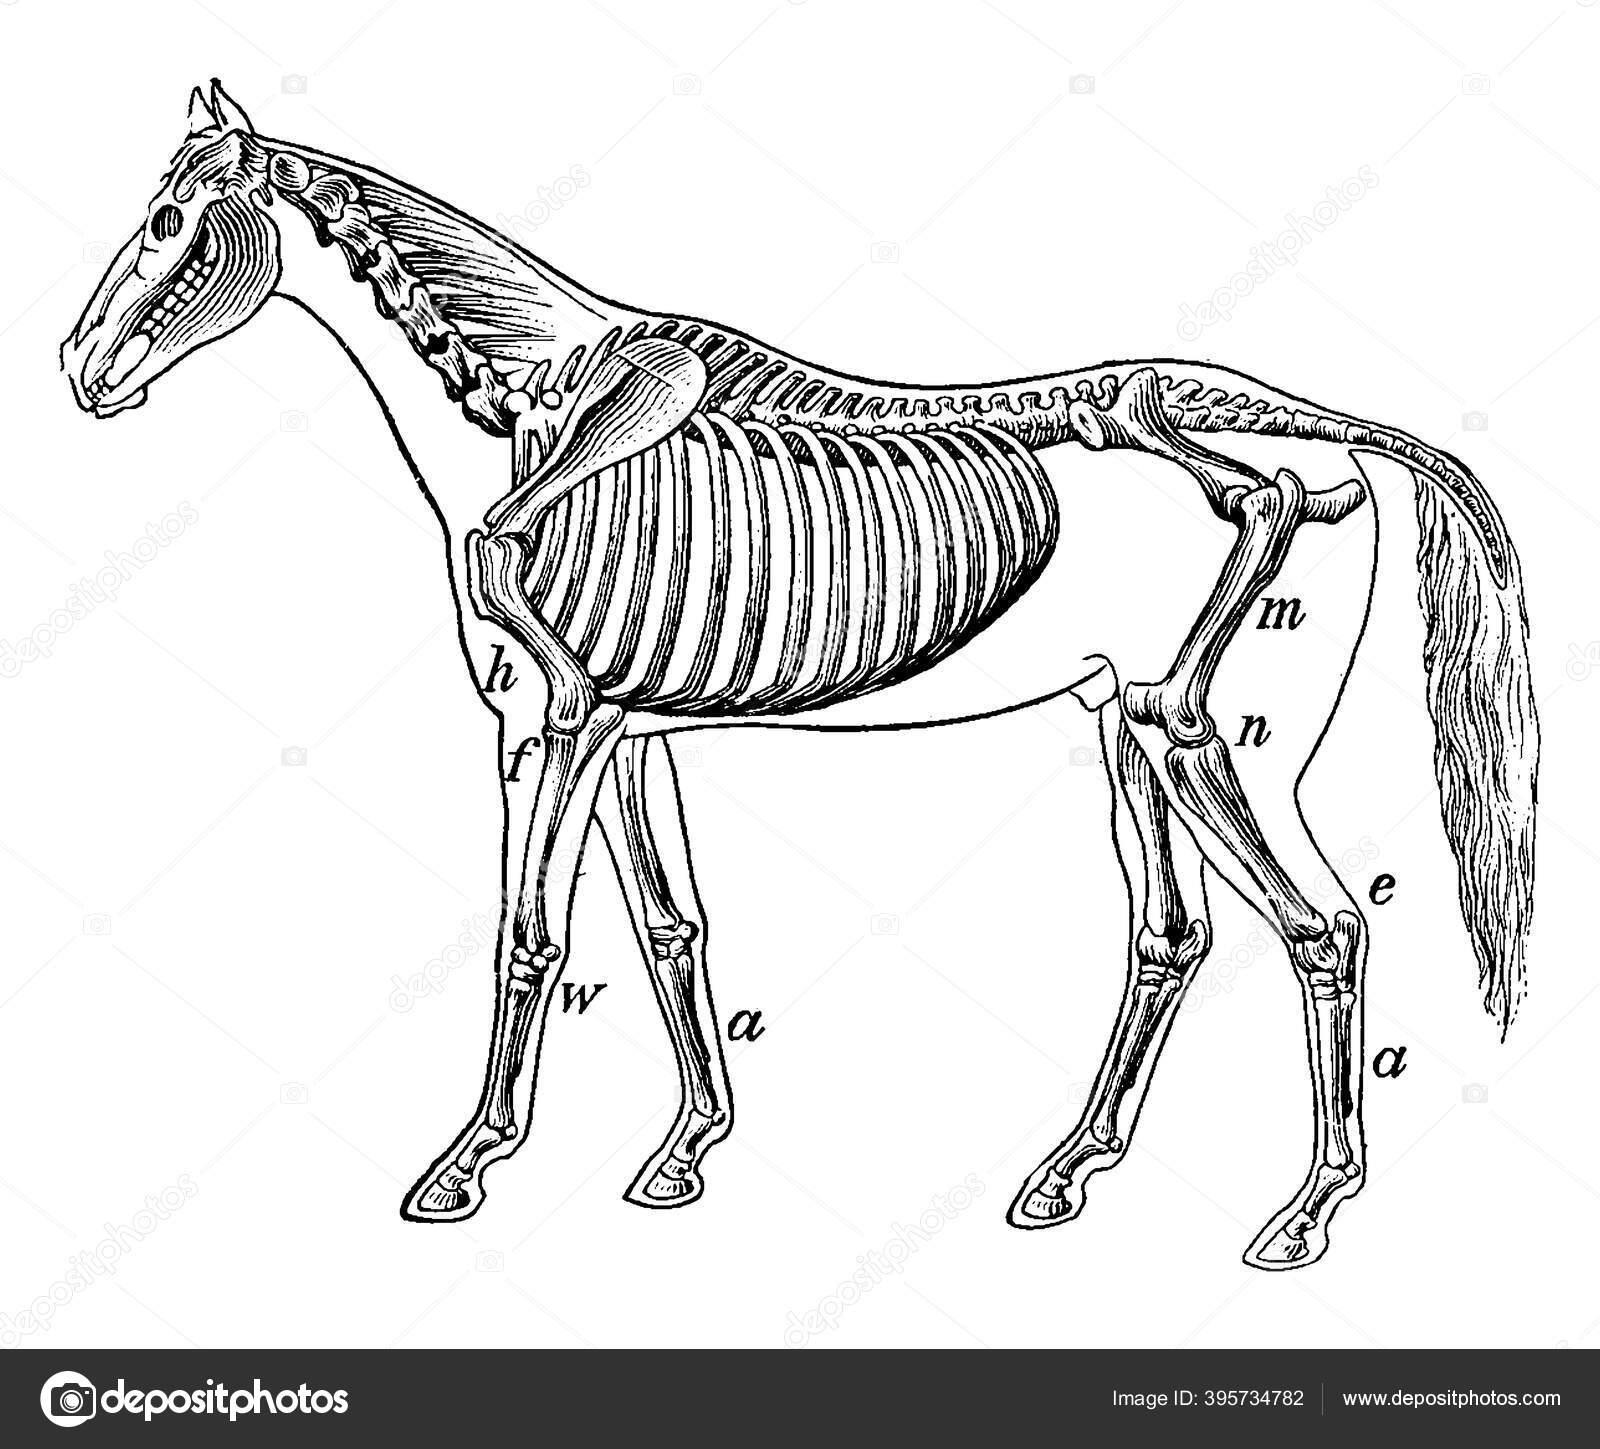 Skeleton Horse Vintage Line Drawing Engraving Illustration Stock Vector C Morphart 395734782